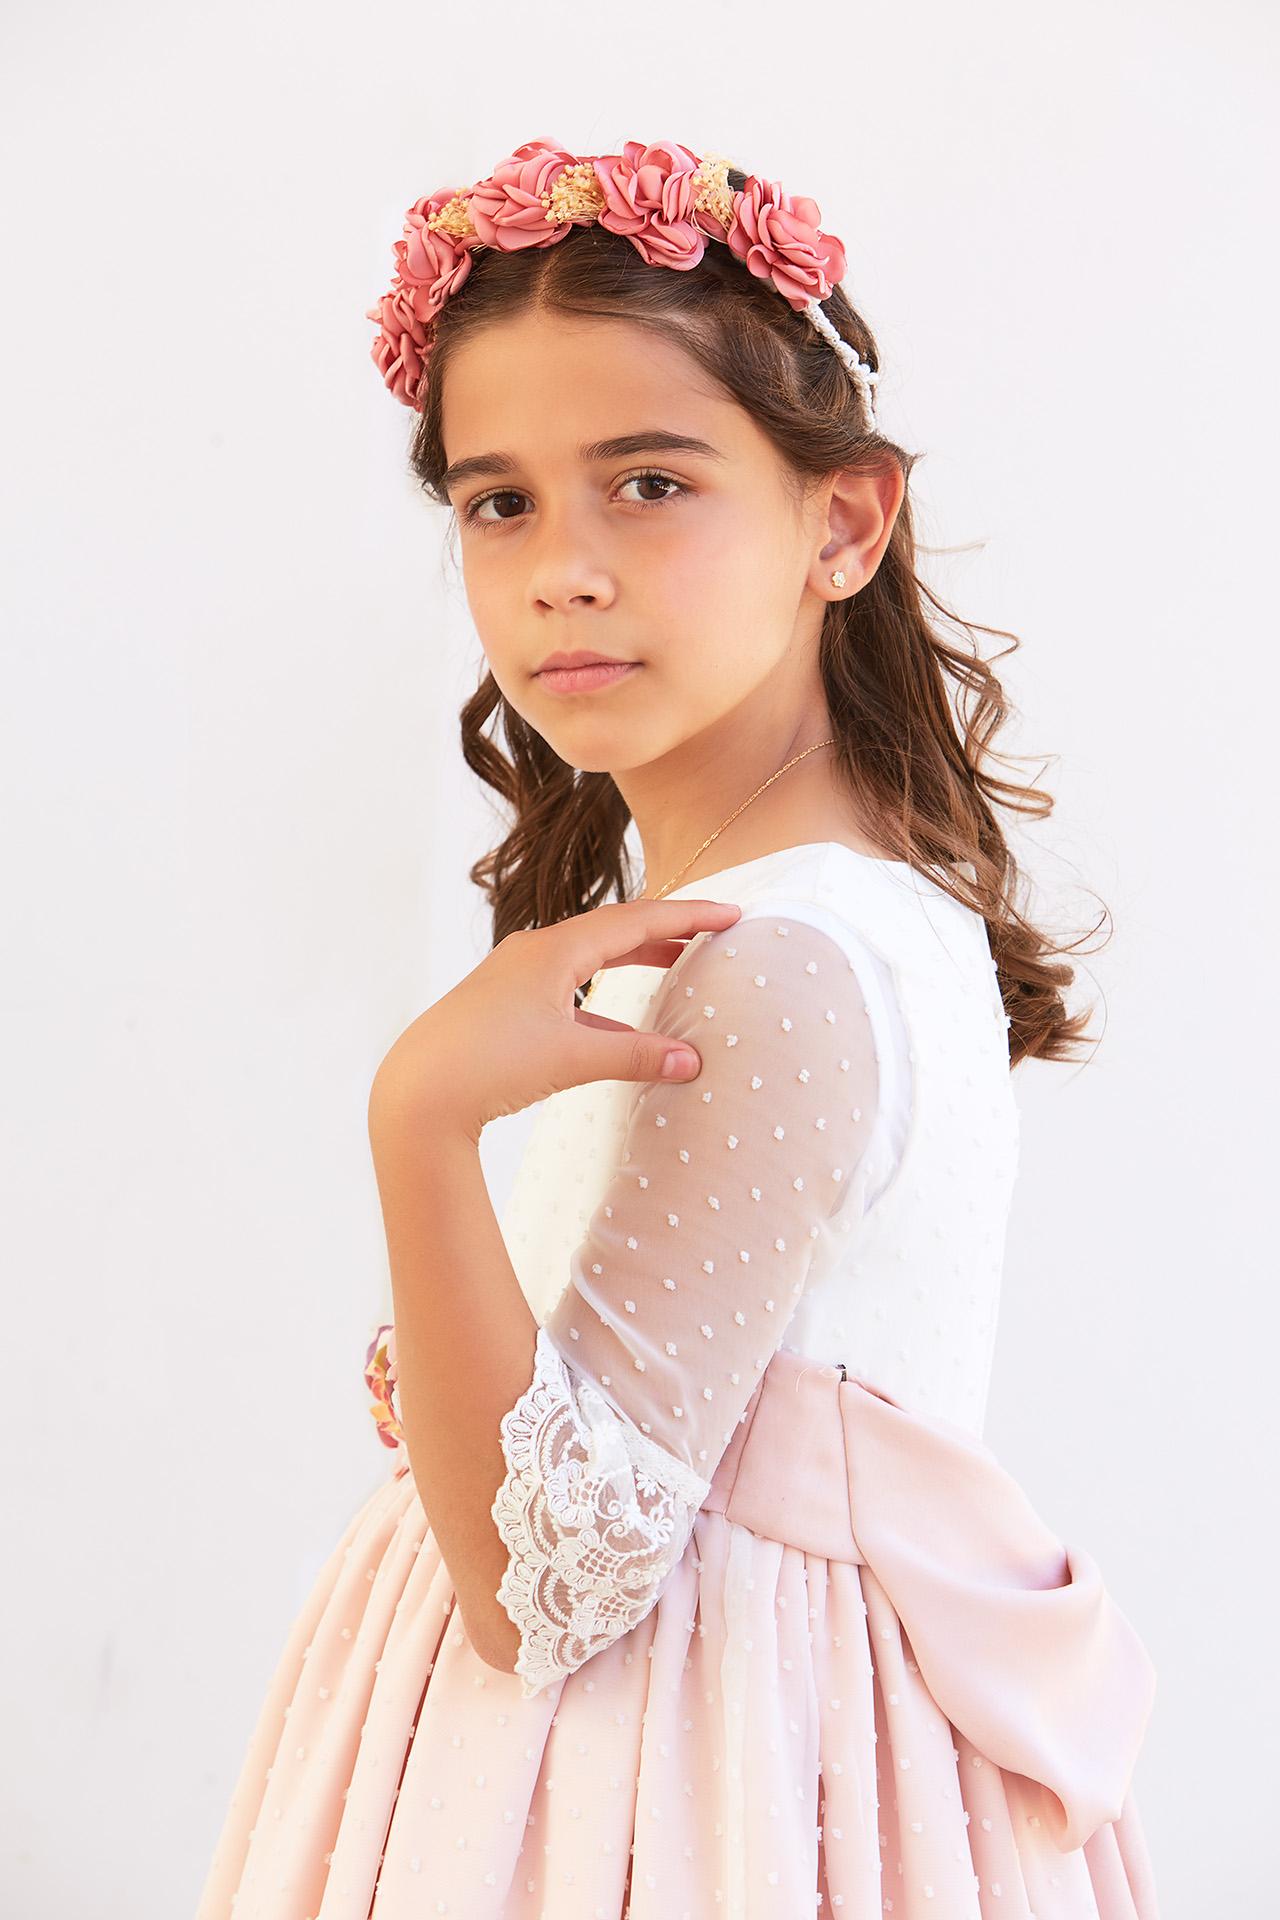 https://www.kidsphotography.es/wp-content/uploads/2021/05/Comunion-Valdespartera-Natalia-2883-©-Kids-Photography-1.jpg